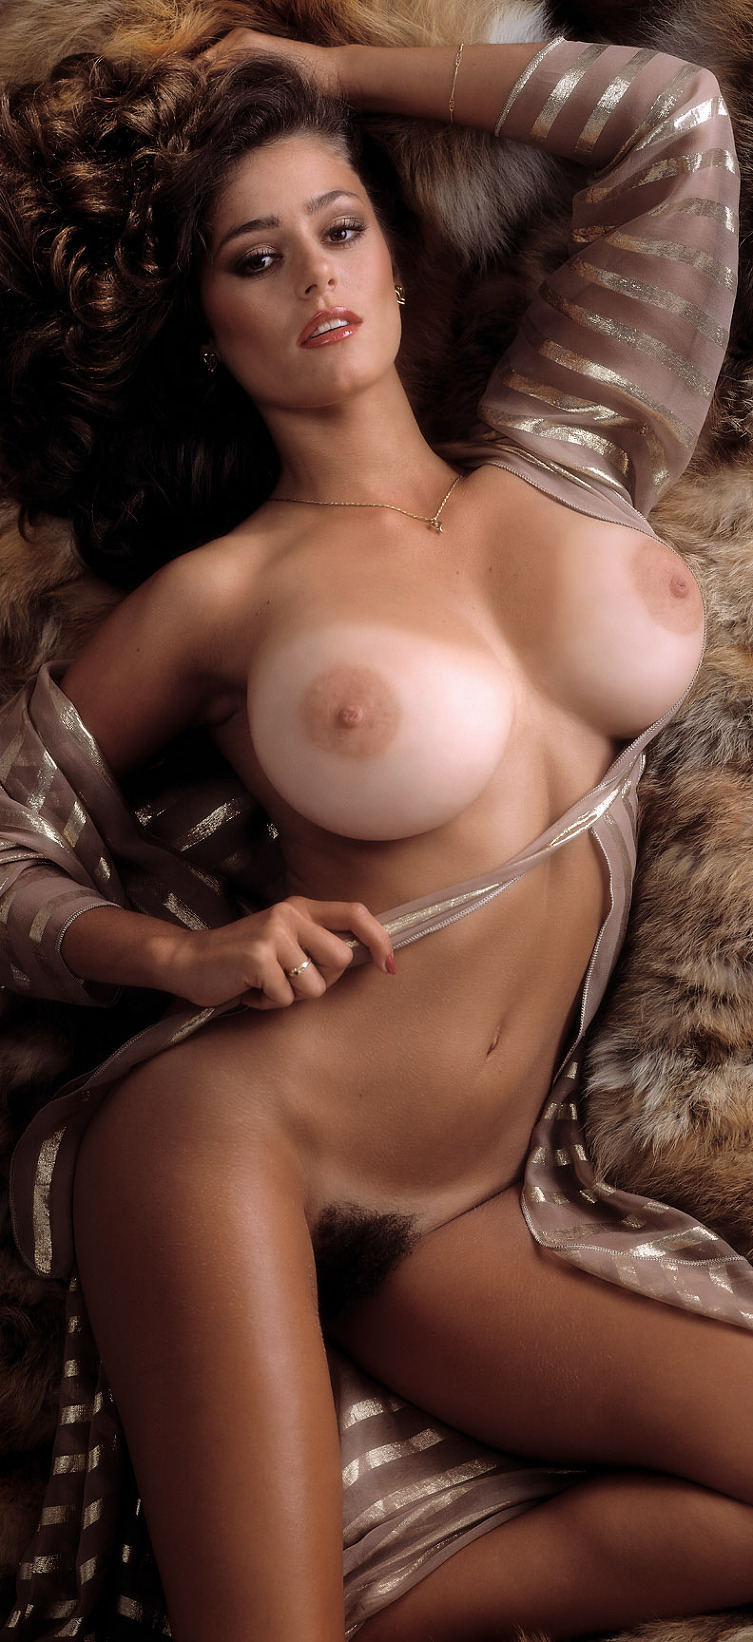 http://cfile205.uf.daum.net/image/15113F174B0769604AC3B4